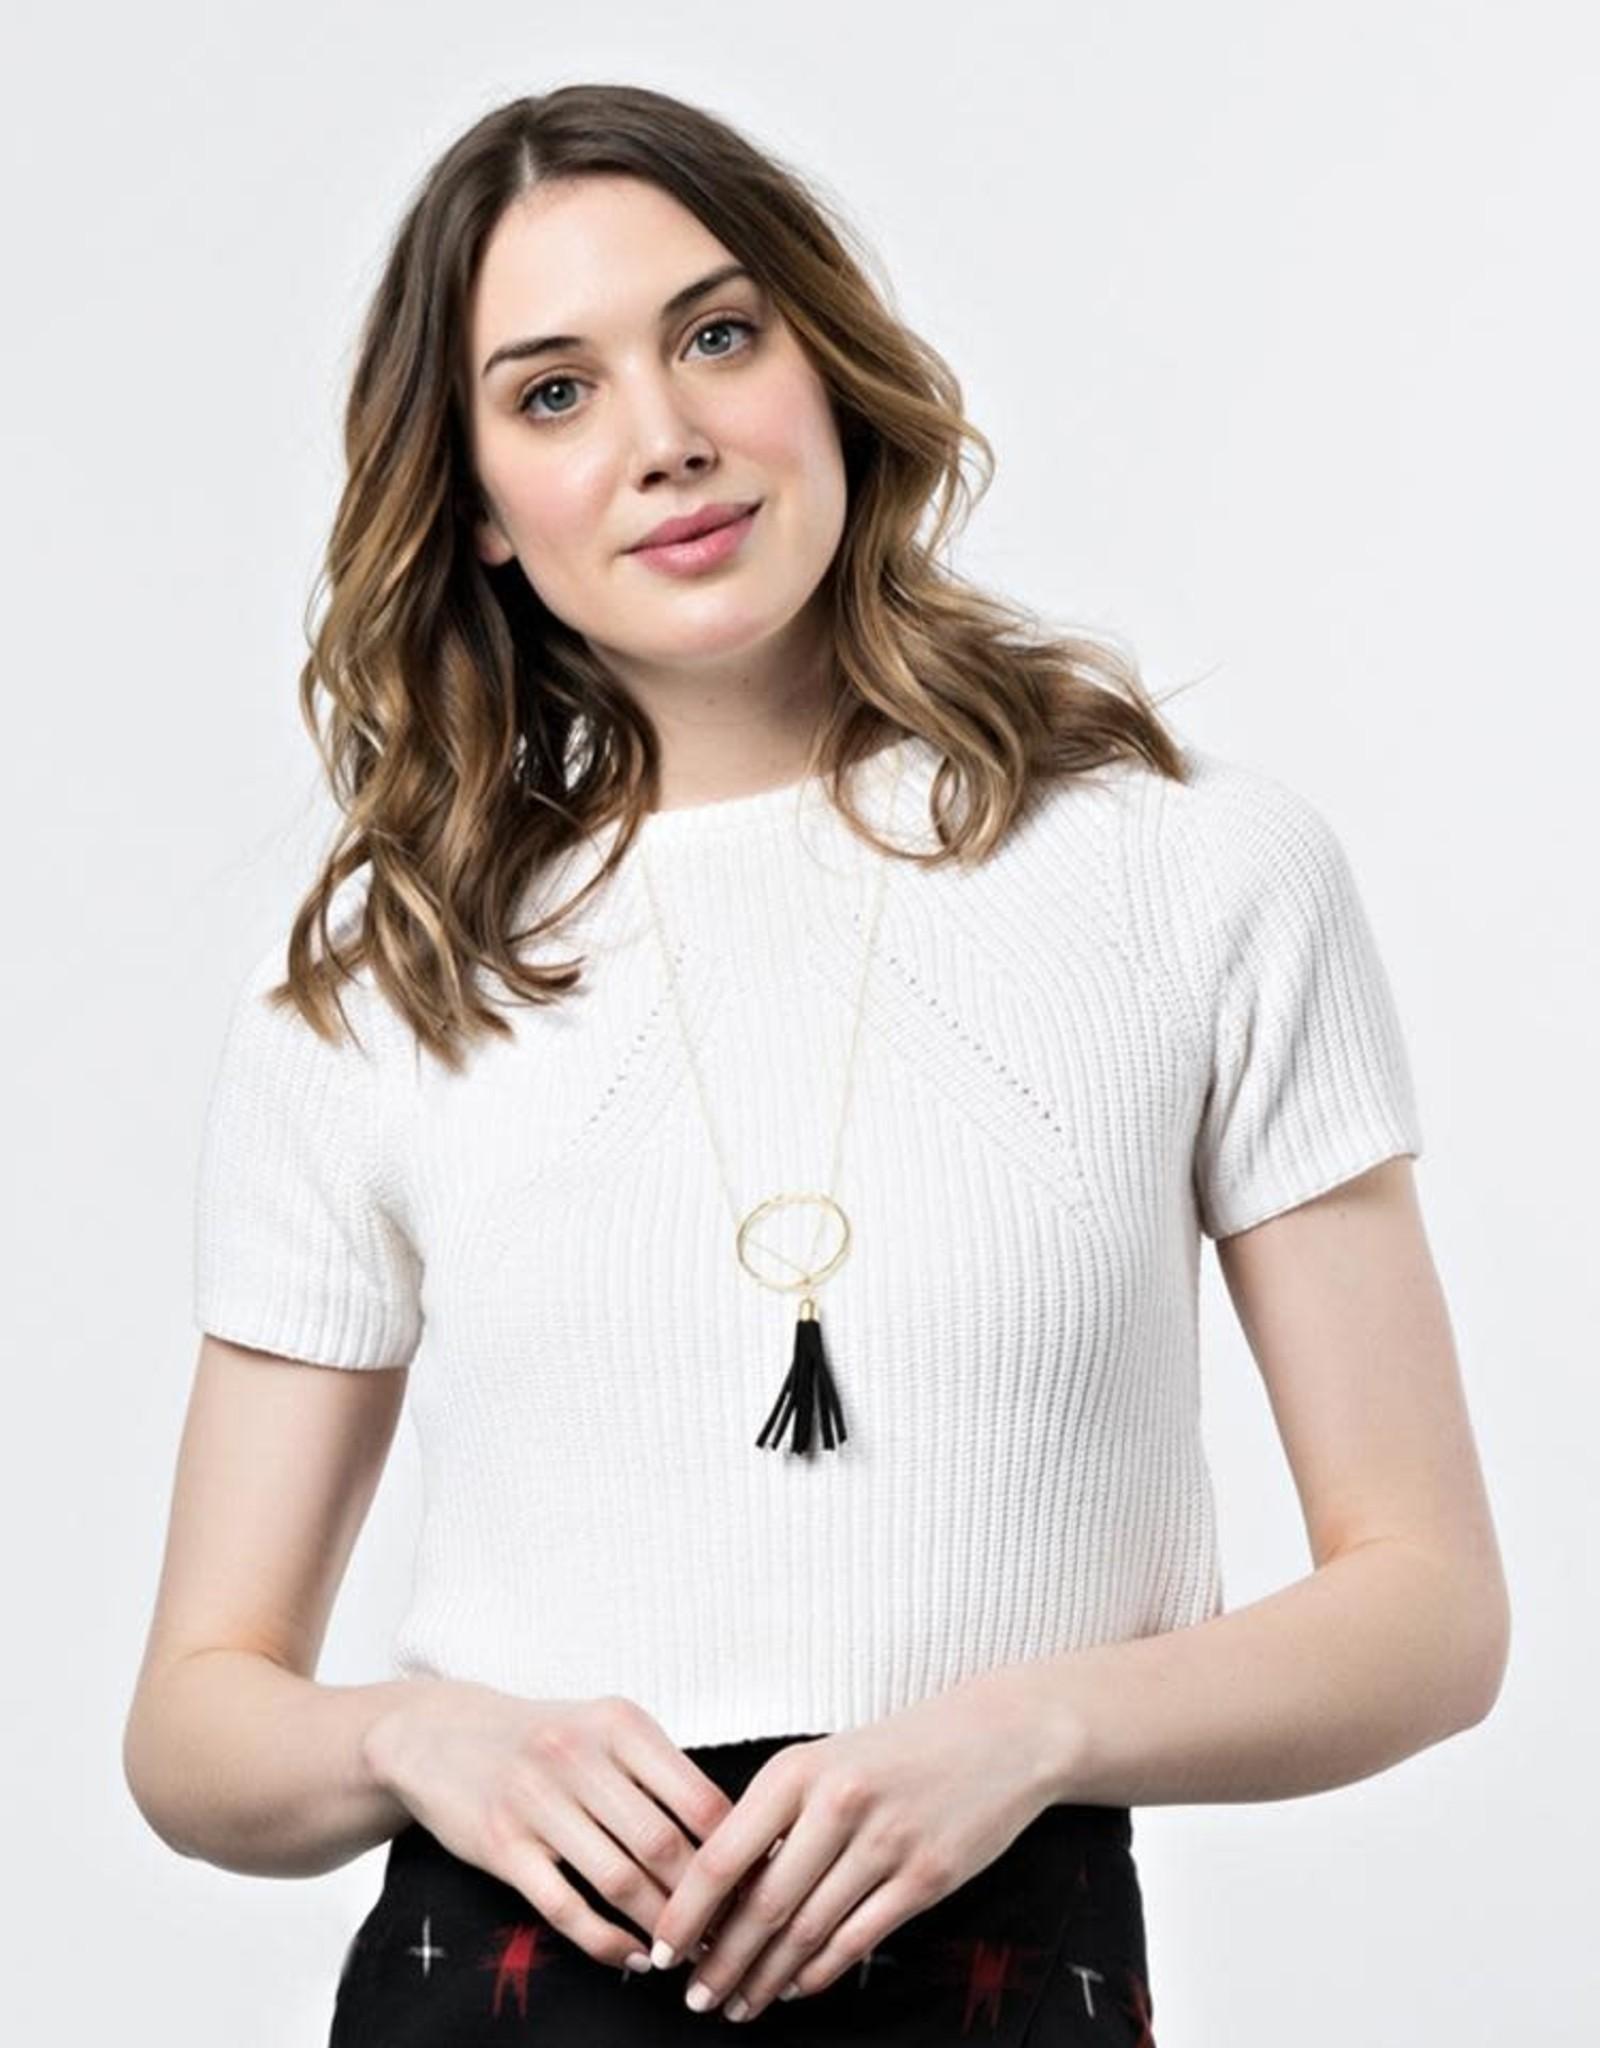 Mata Traders Ellaria Black Tassel Necklace - Mata Traders